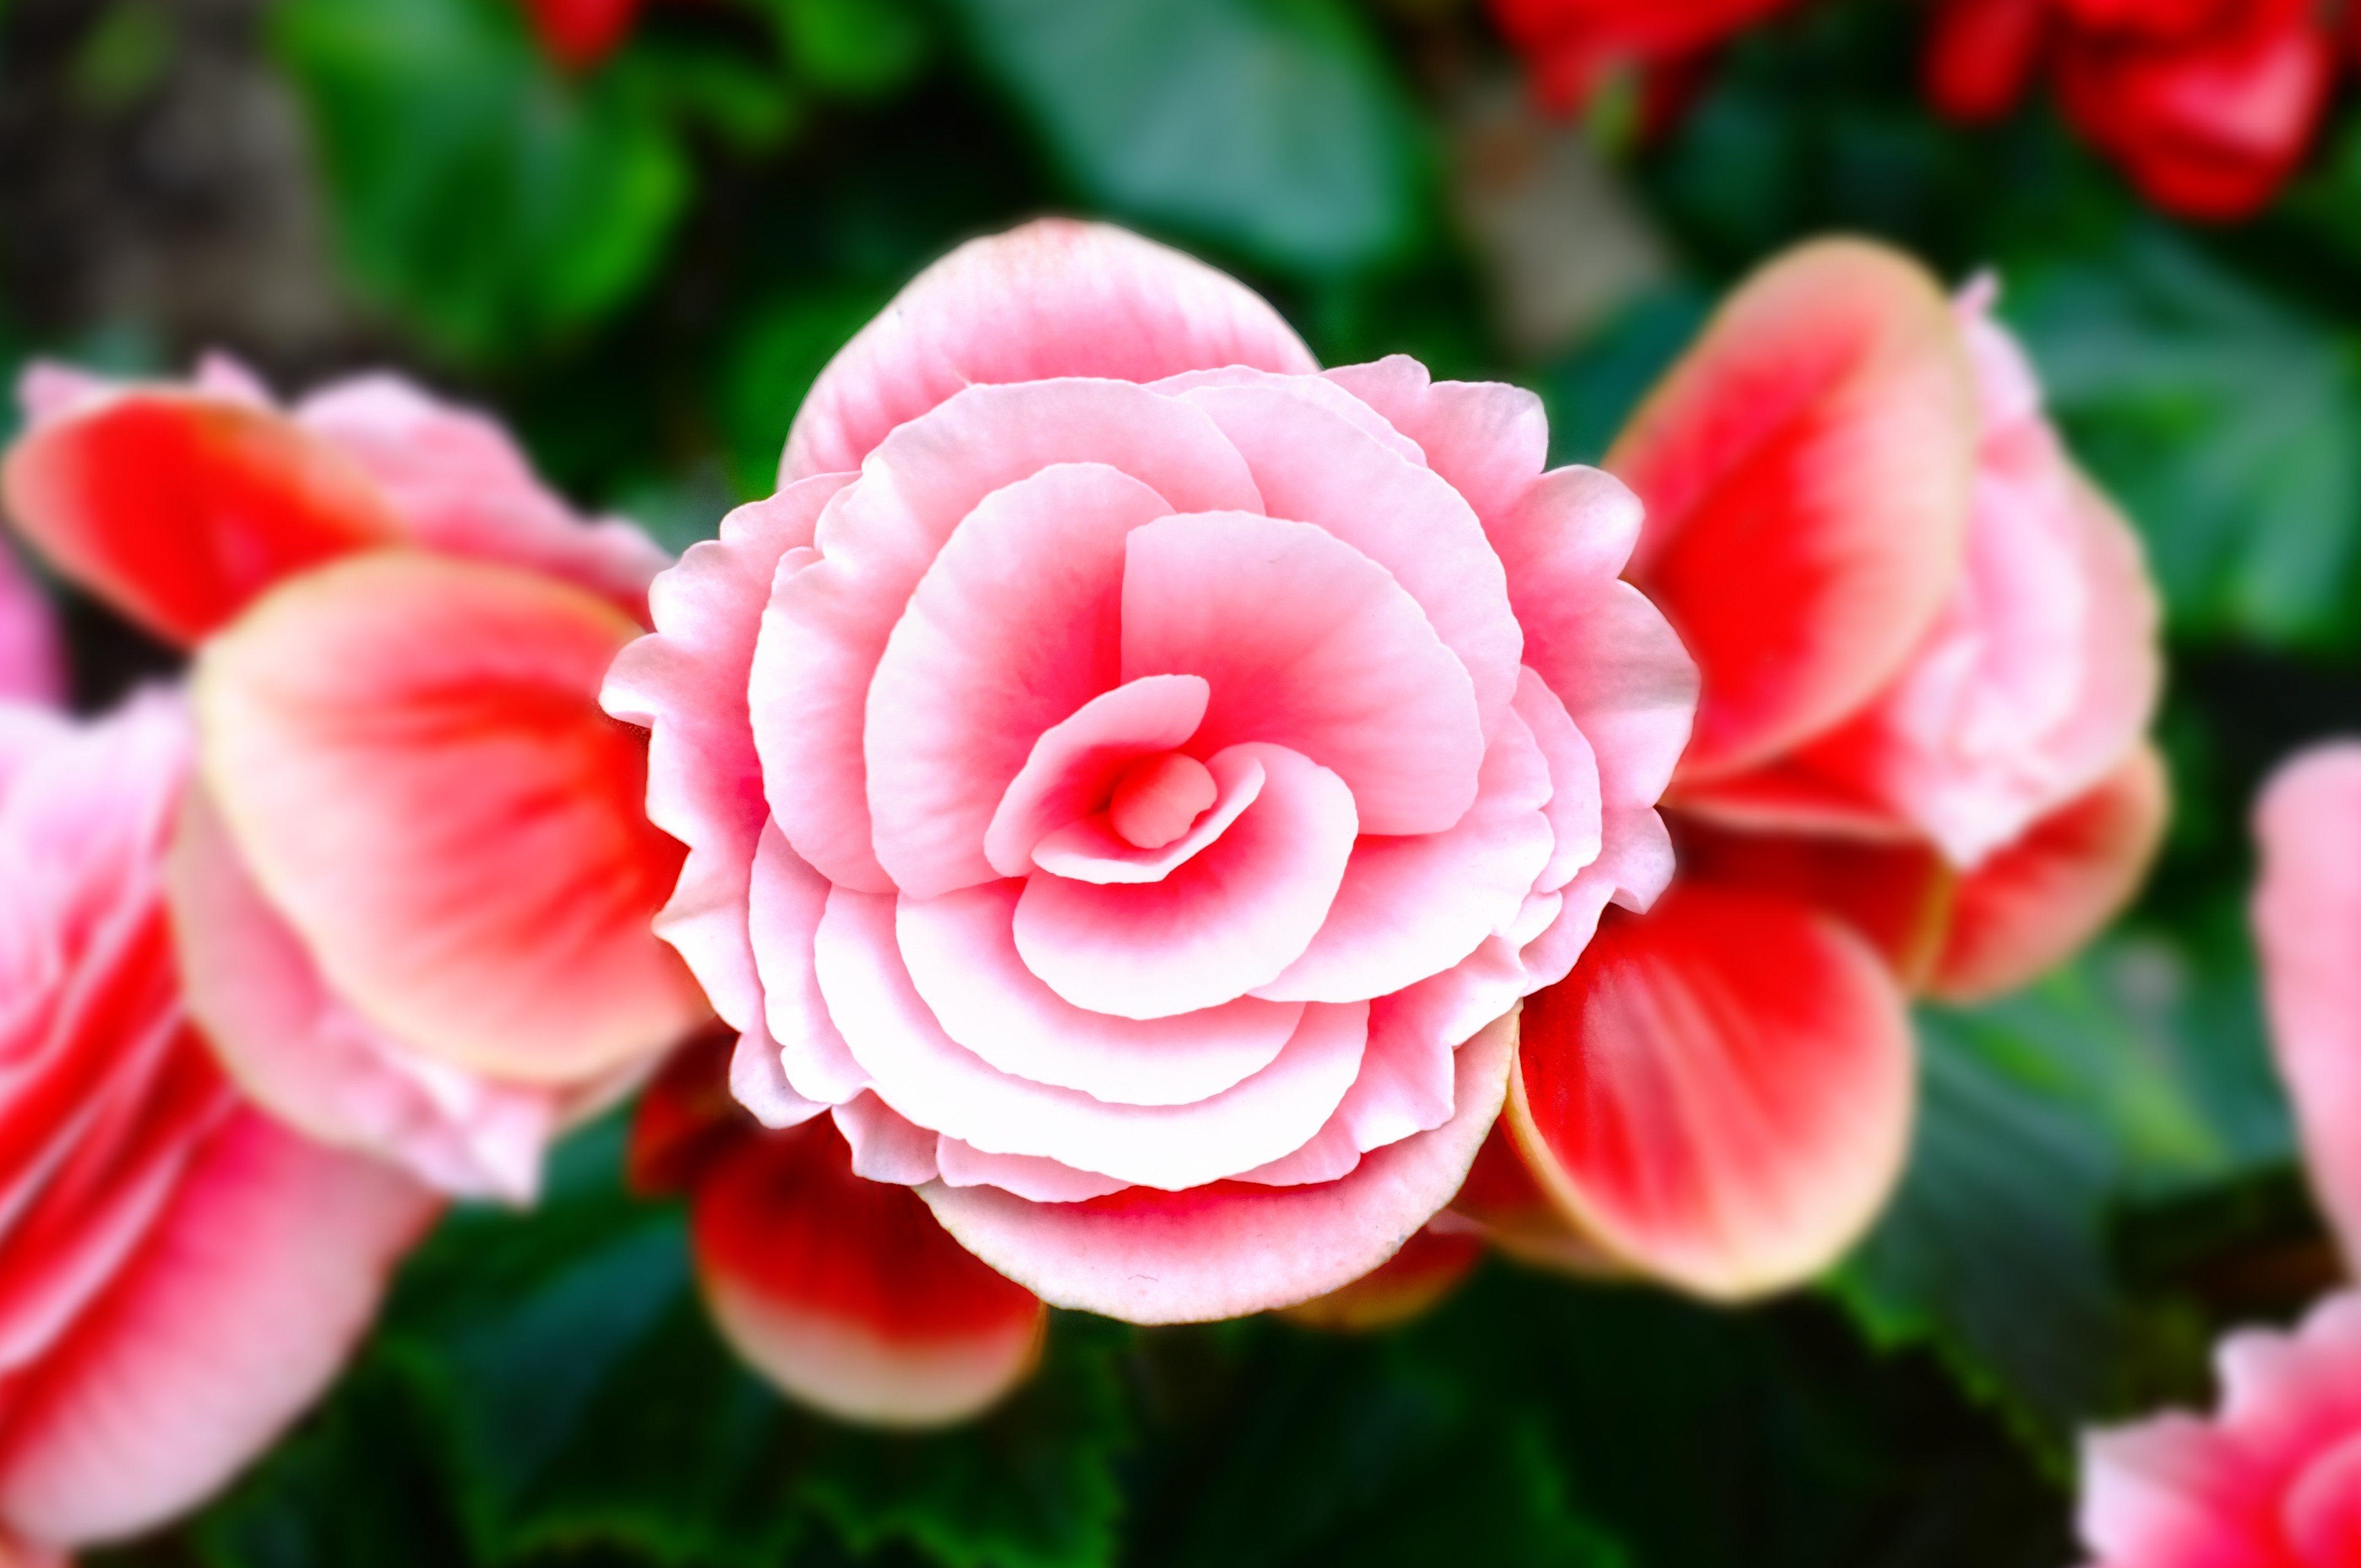 Delicate Pink Flowers Iphone Wallpaper Idrop News